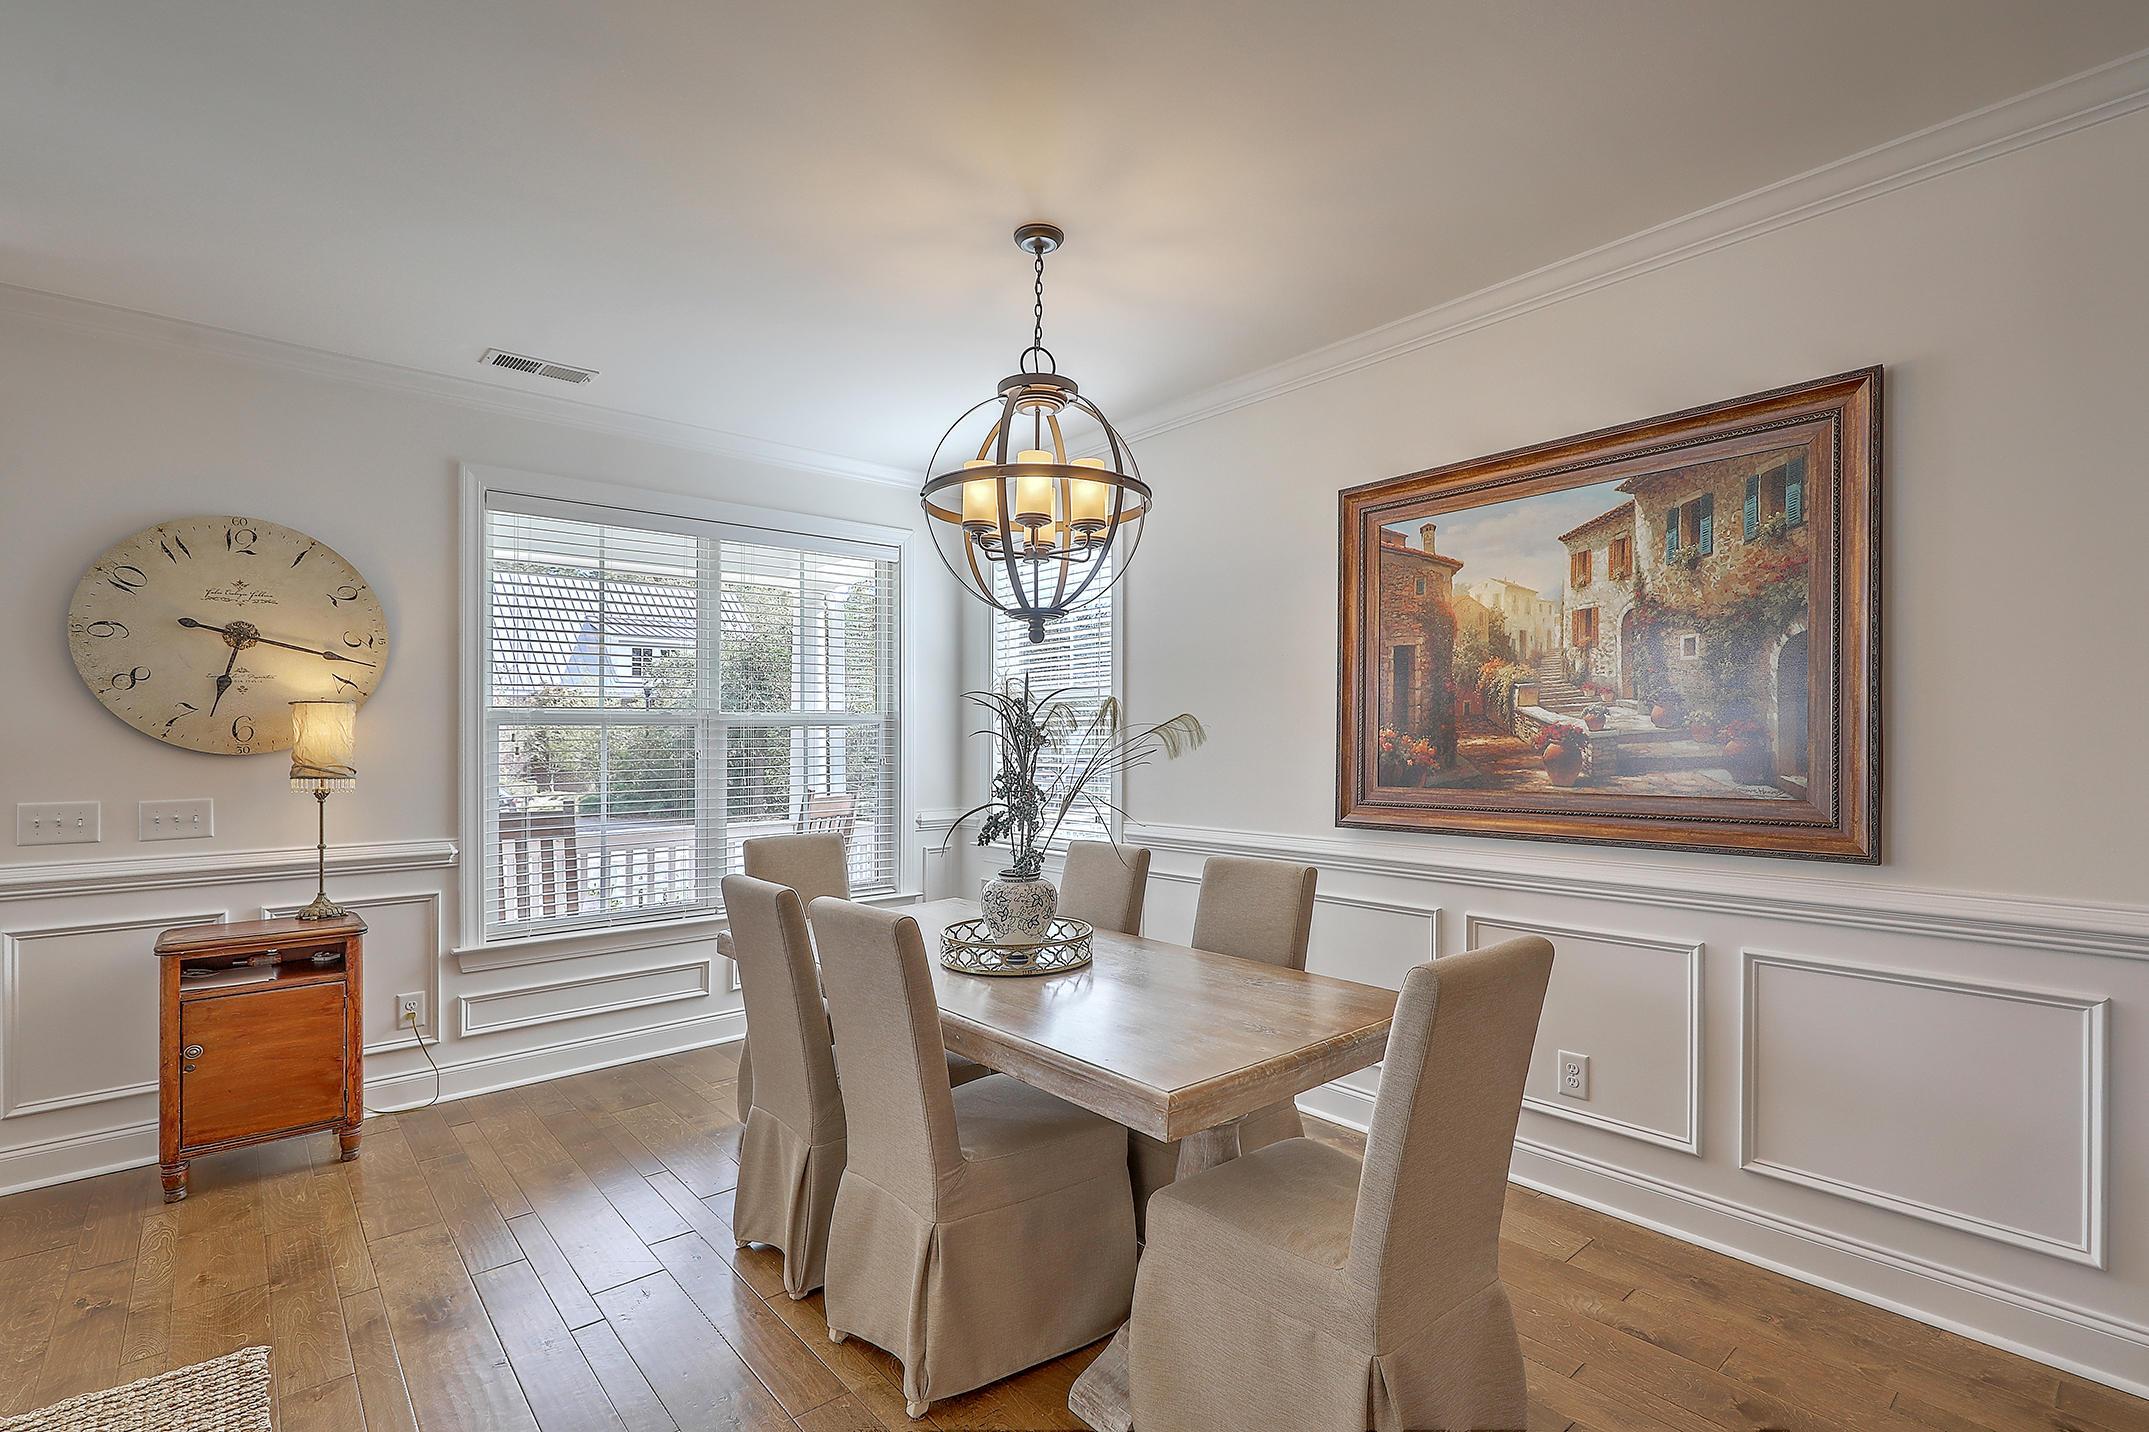 Park West Homes For Sale - 3412 Salterbeck, Mount Pleasant, SC - 8